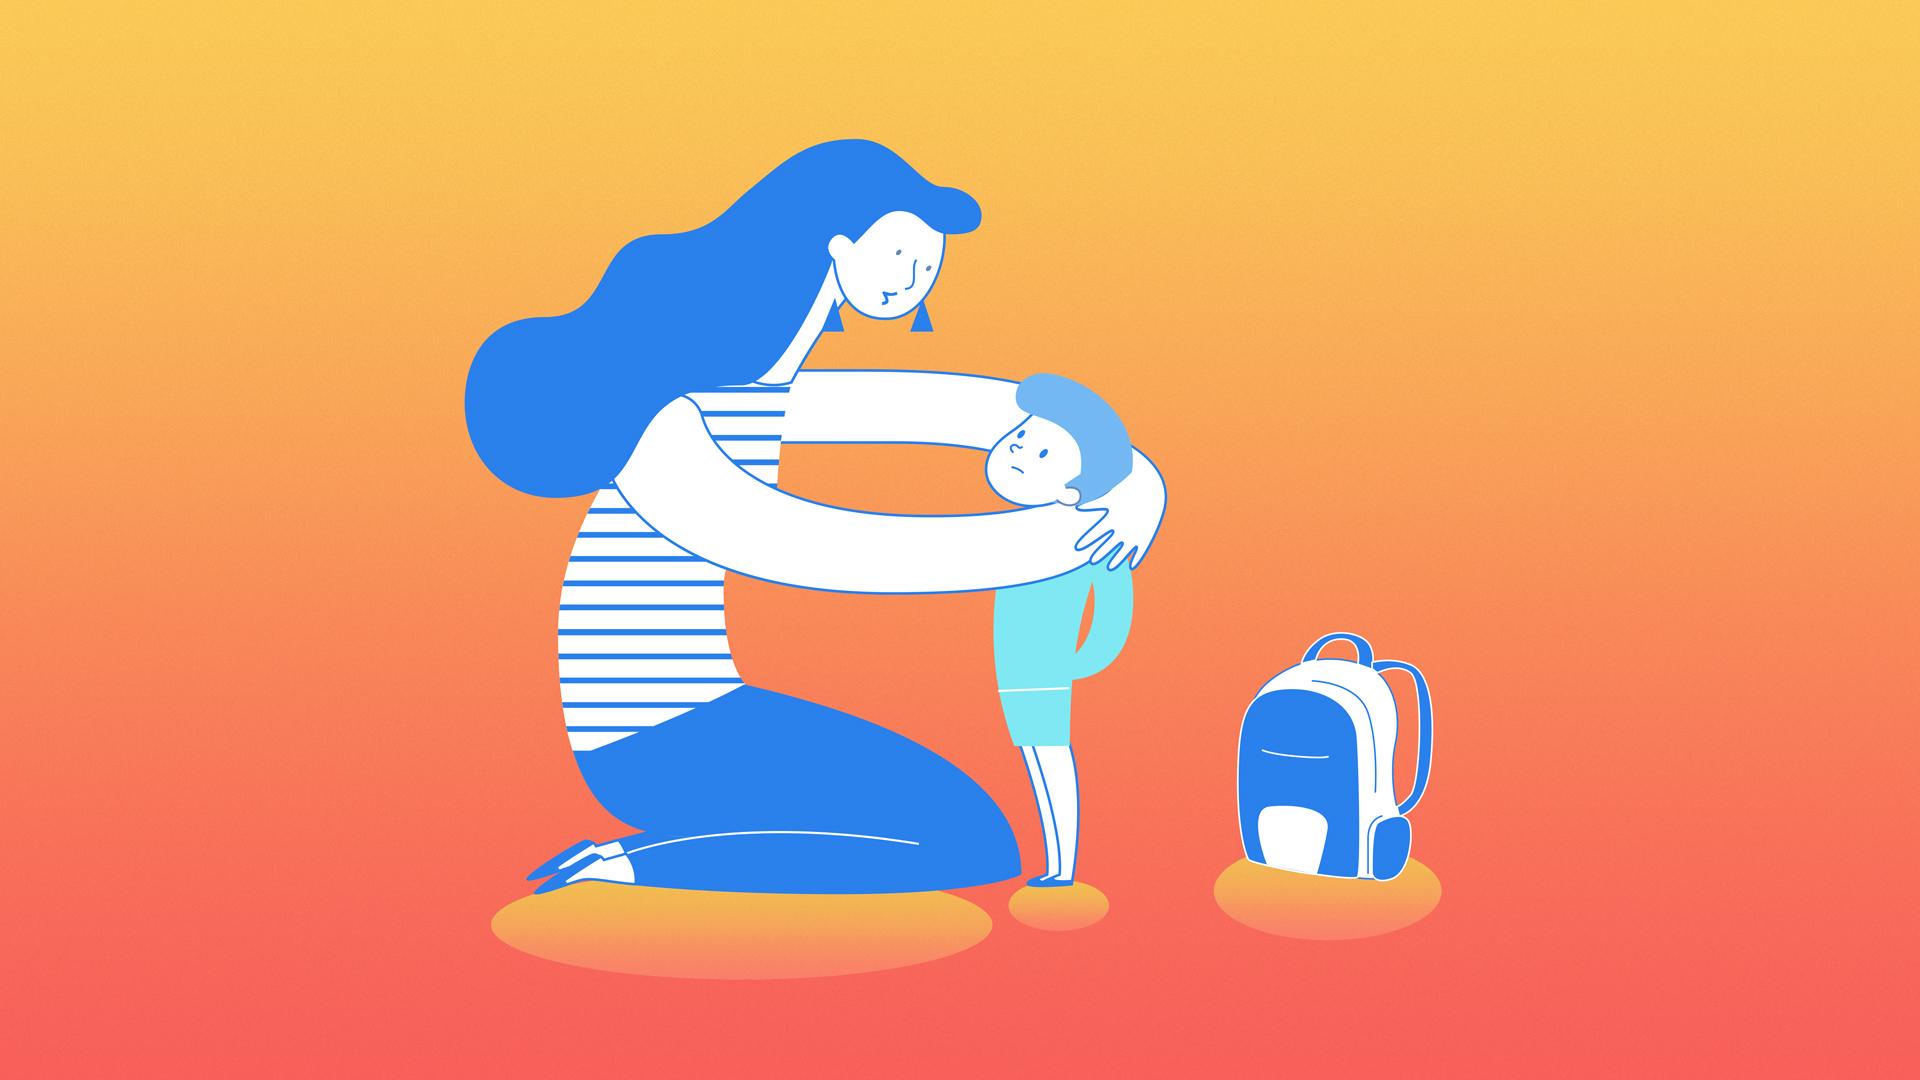 Mom hugging little boy with backpack